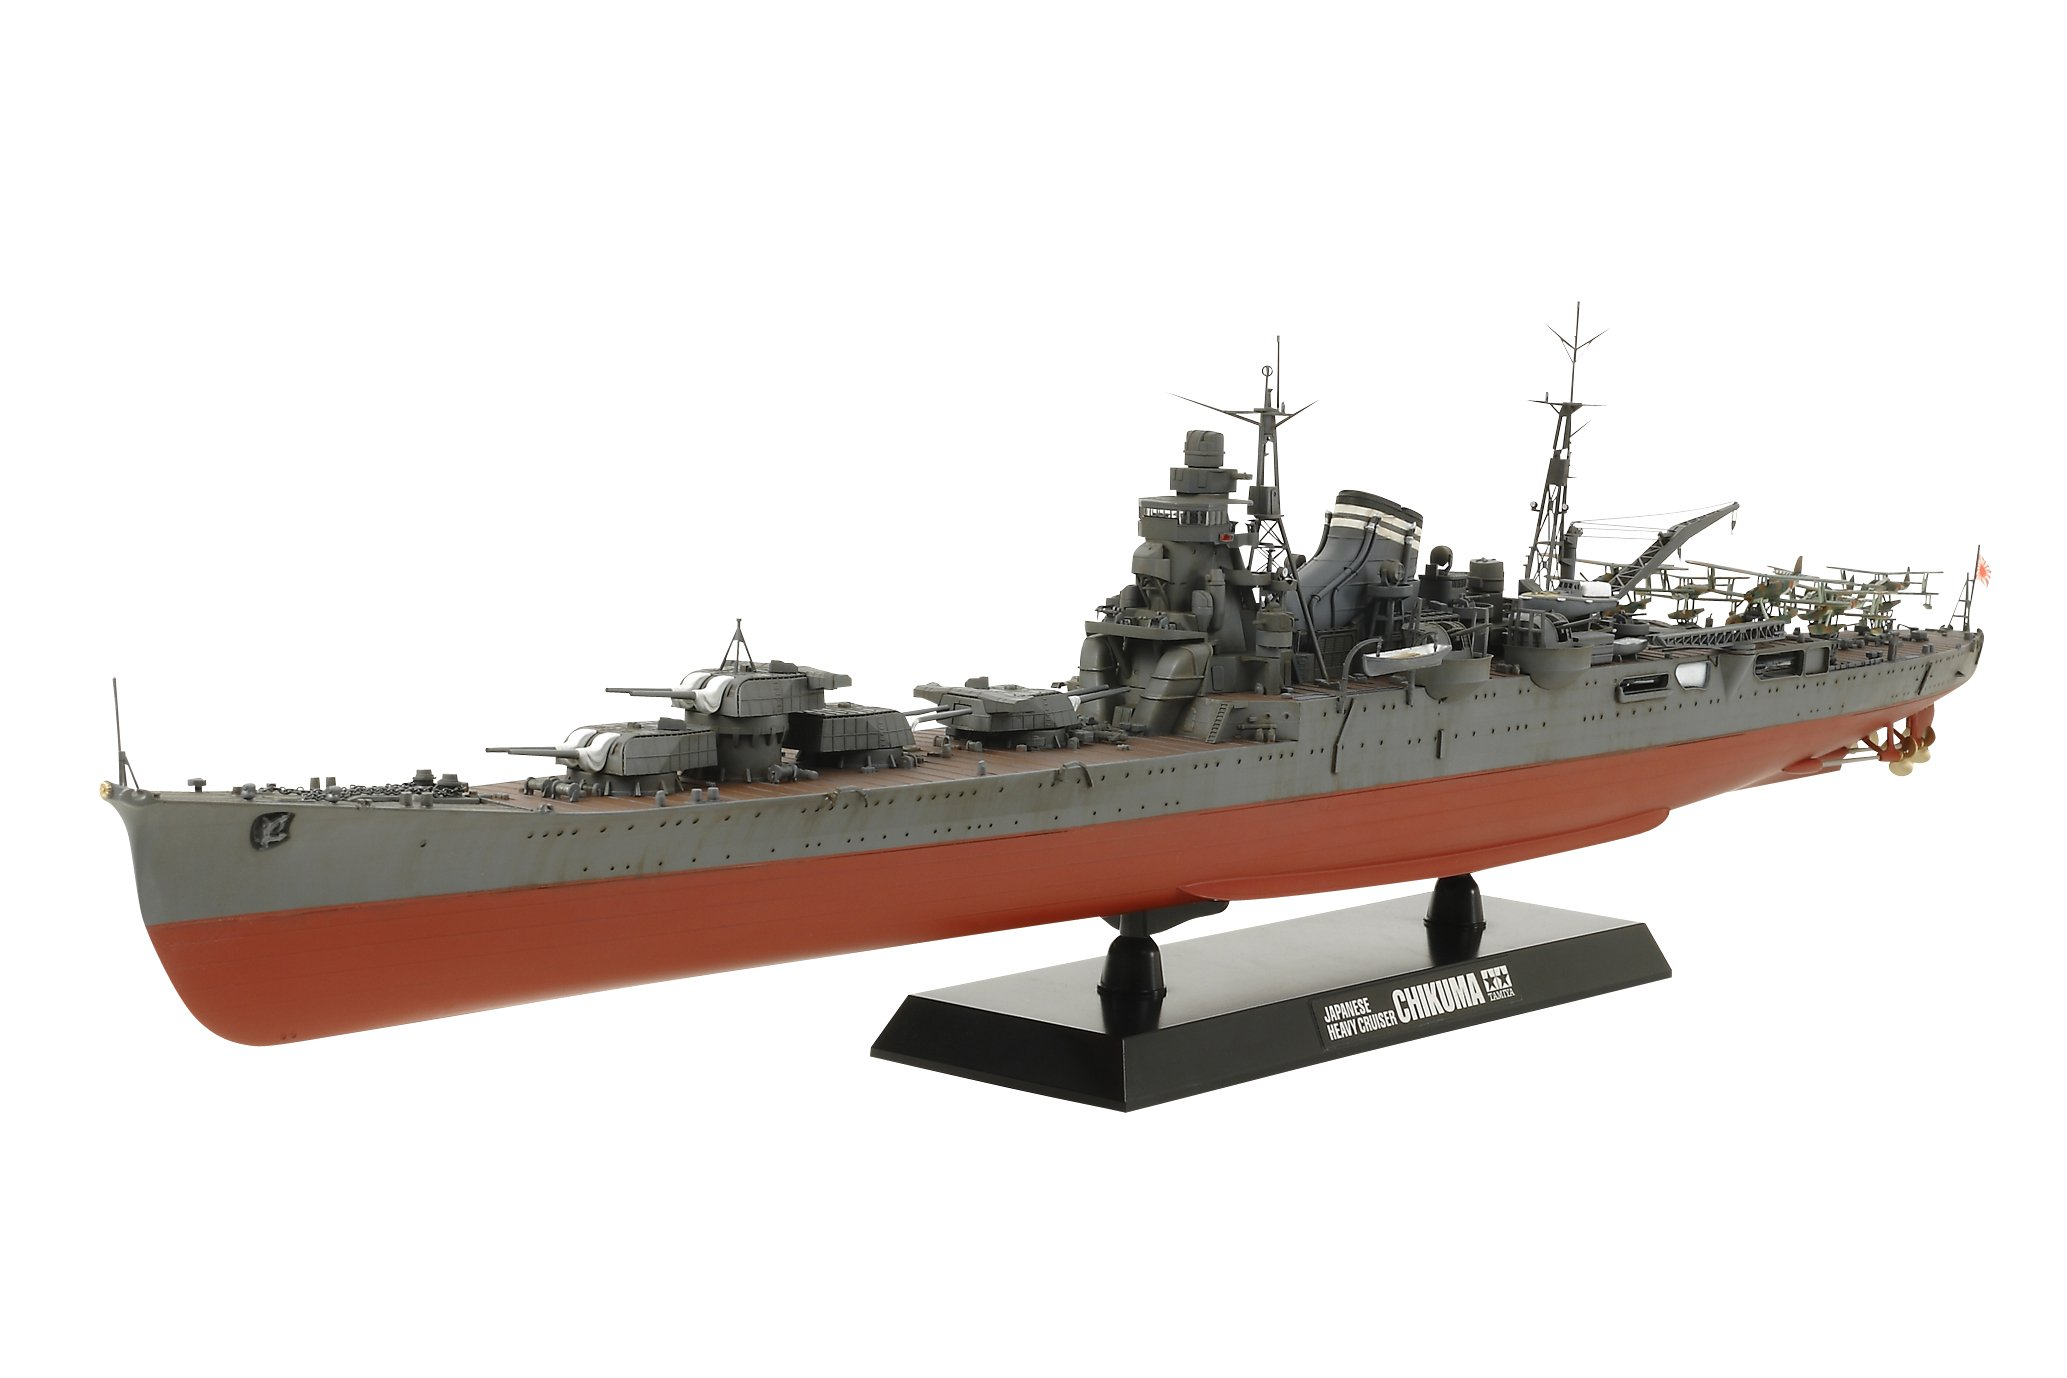 Tamiya 300078027 1:350 WWII Japanese Chikuma Model Cruiser